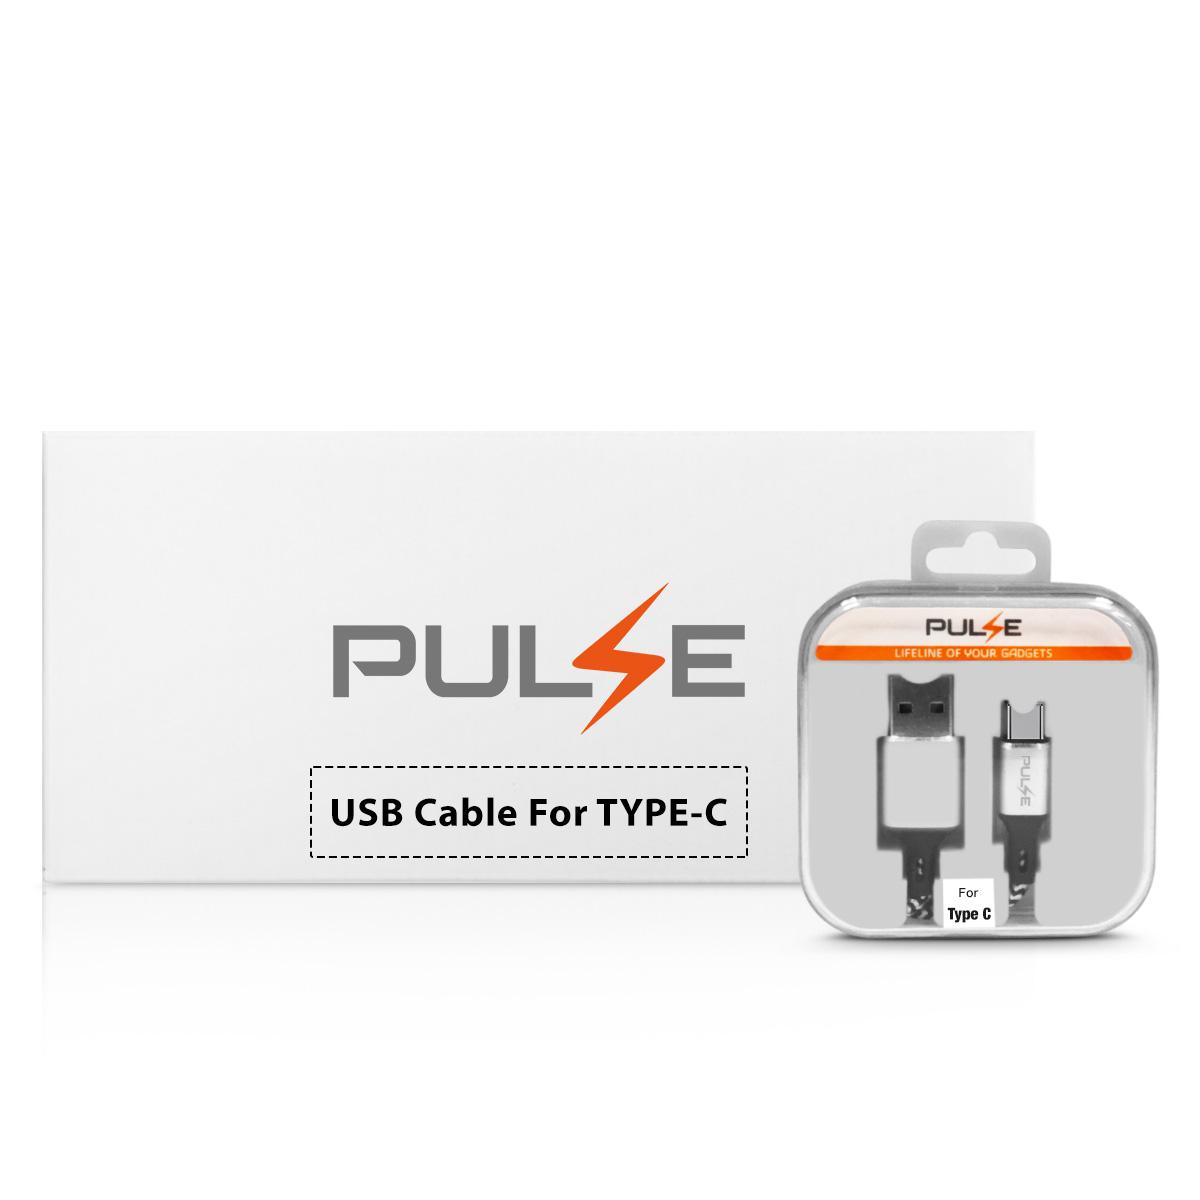 10PC-4F-NL-USB-V8-WT